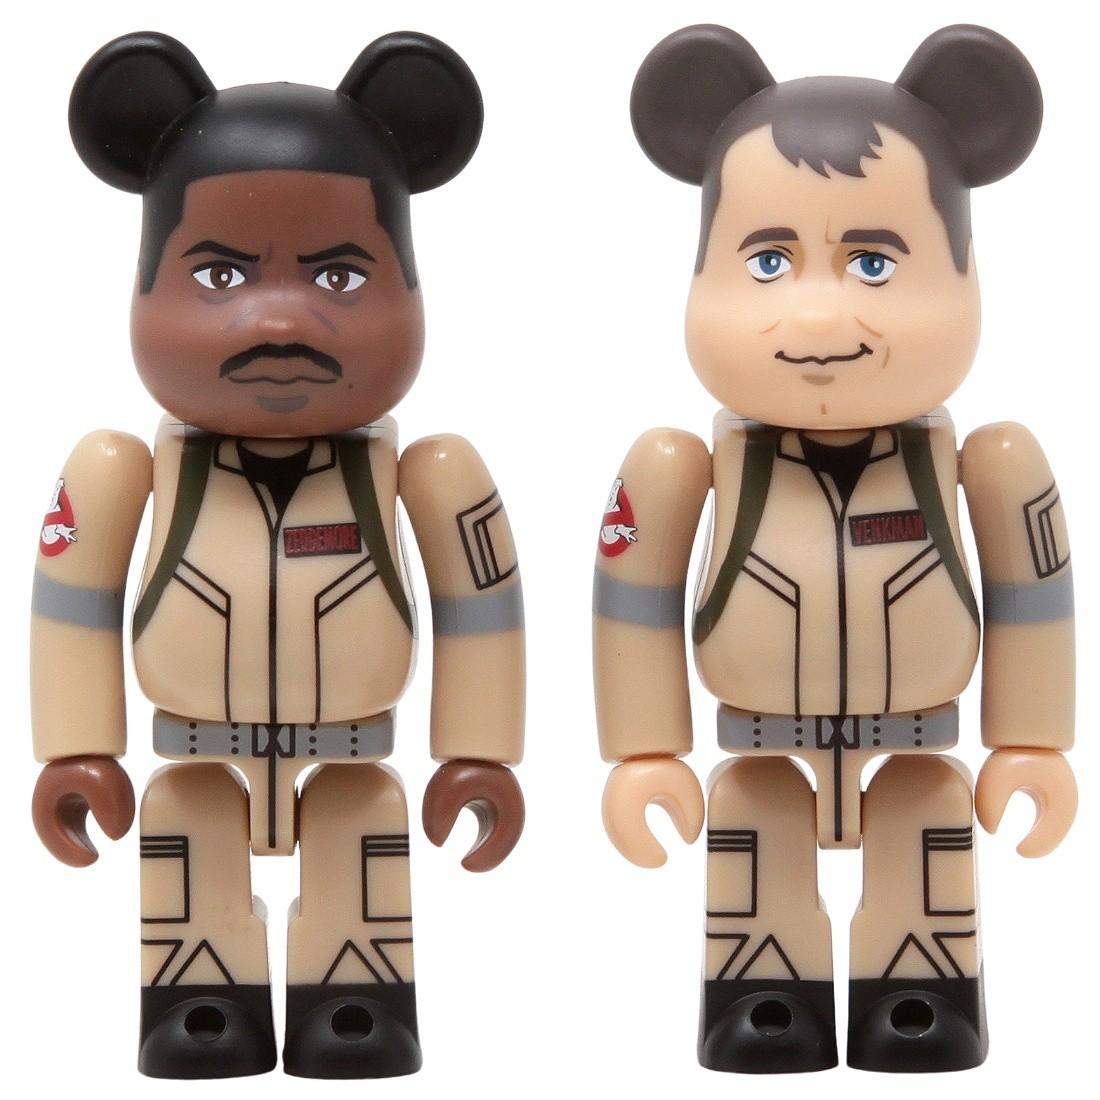 Medicom Ghostbusters Peter Venkman And Winston Zeddemor 100% 2 Pack Bearbrick Figure Set (tan)